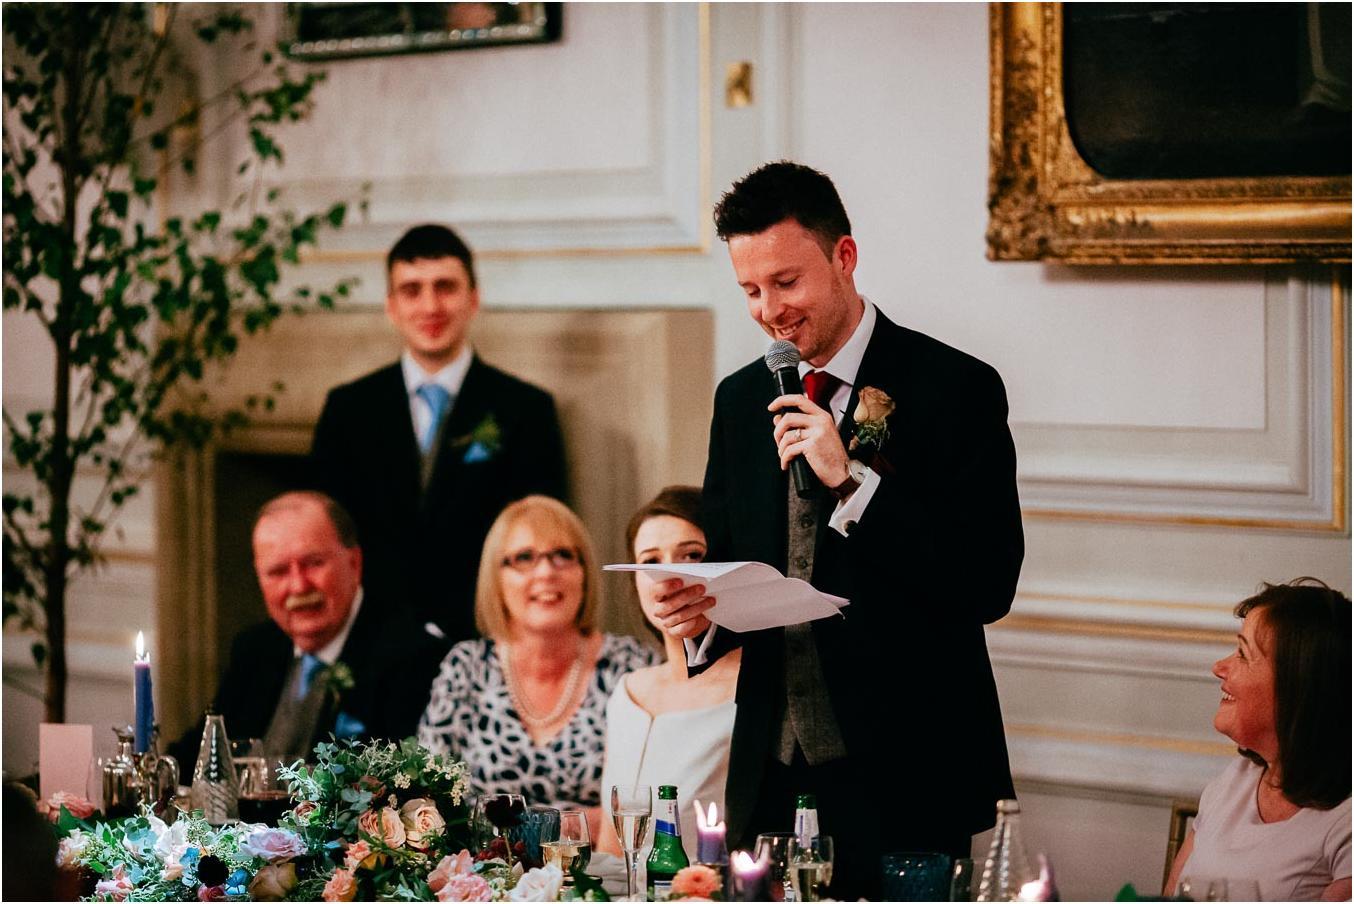 Hassop_Hall_Wedding_Photographs-107.jpg